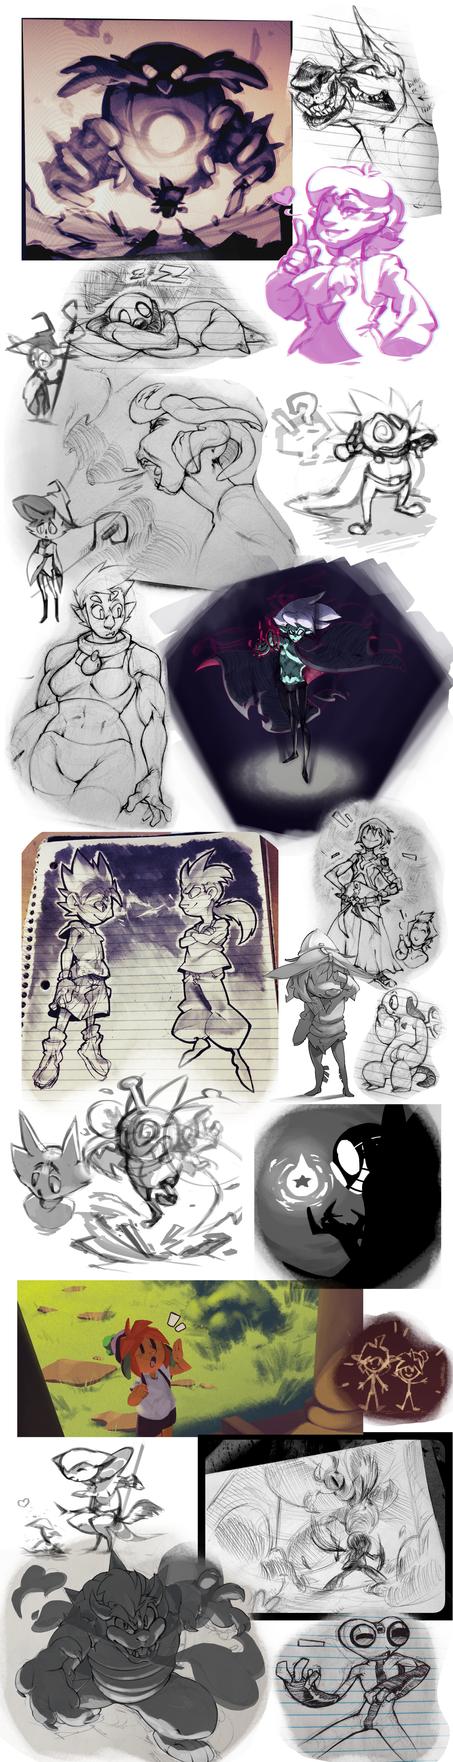 Mega Sketch Dump 2 by DroseAttack